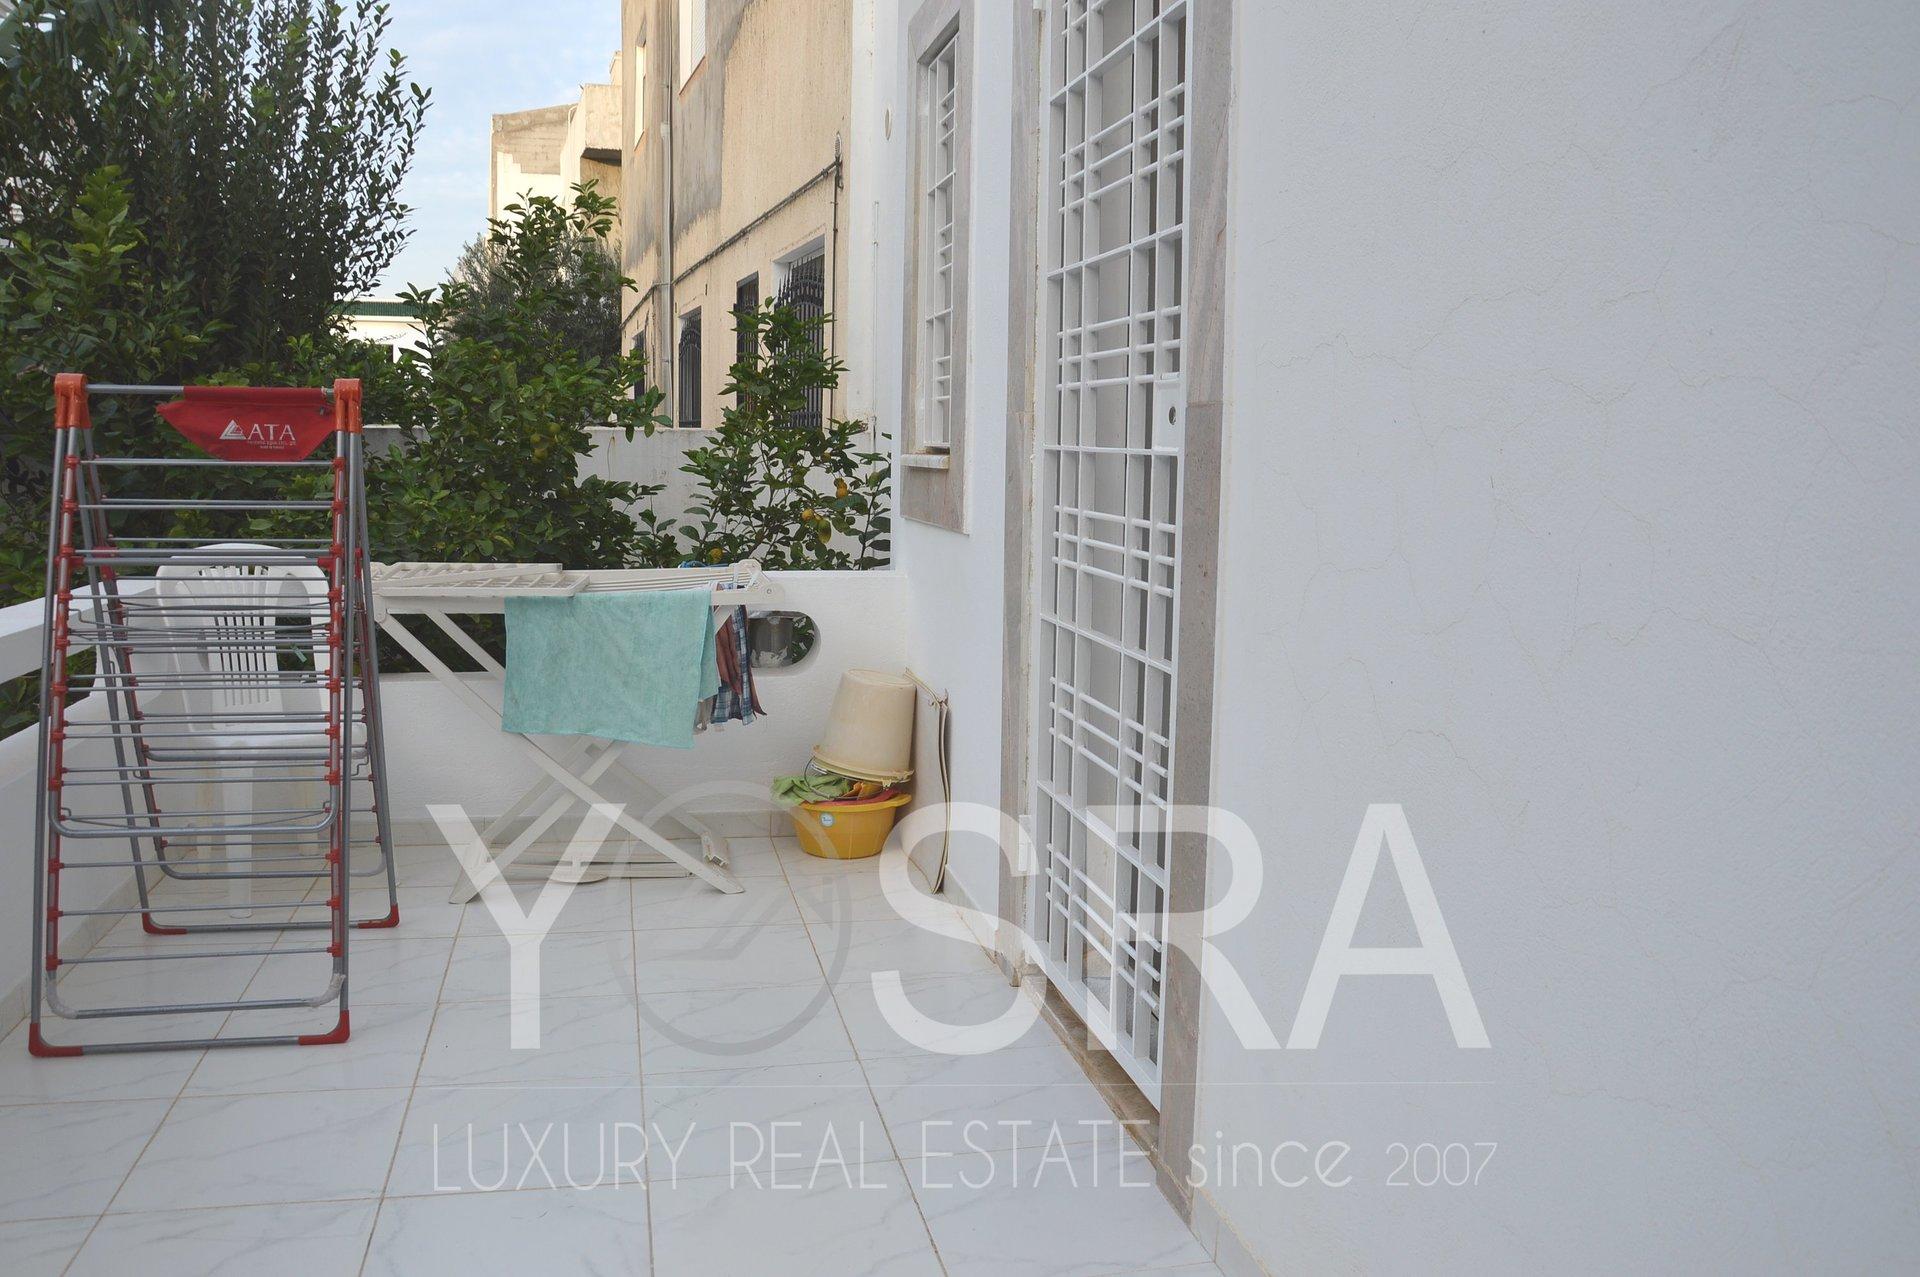 Sale Villa - Tunis El Aouina - Tunisia